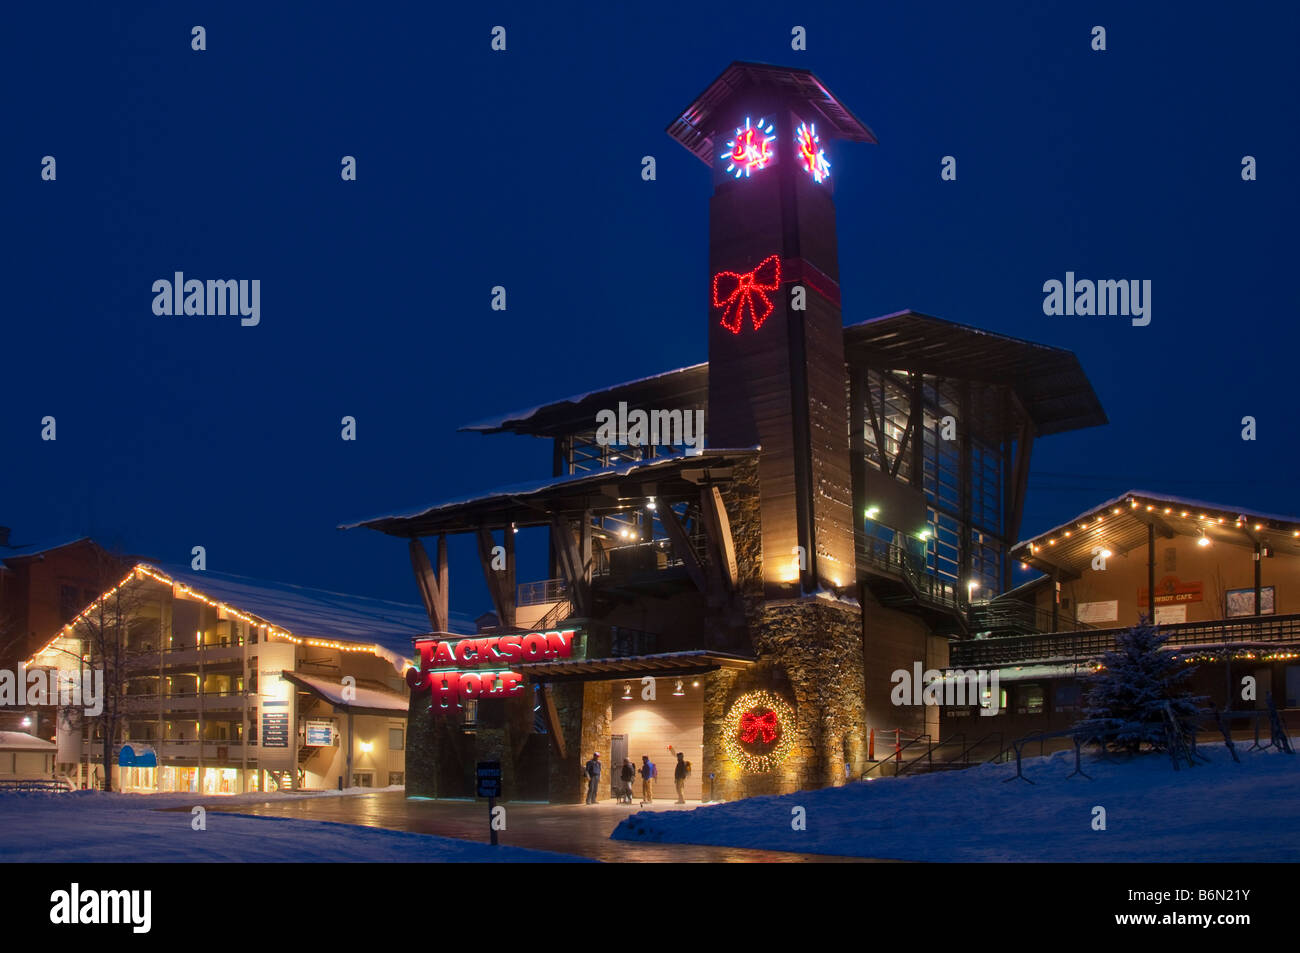 Wyoming, Jackson Hole Stockfotos & Wyoming, Jackson Hole Bilder - Alamy